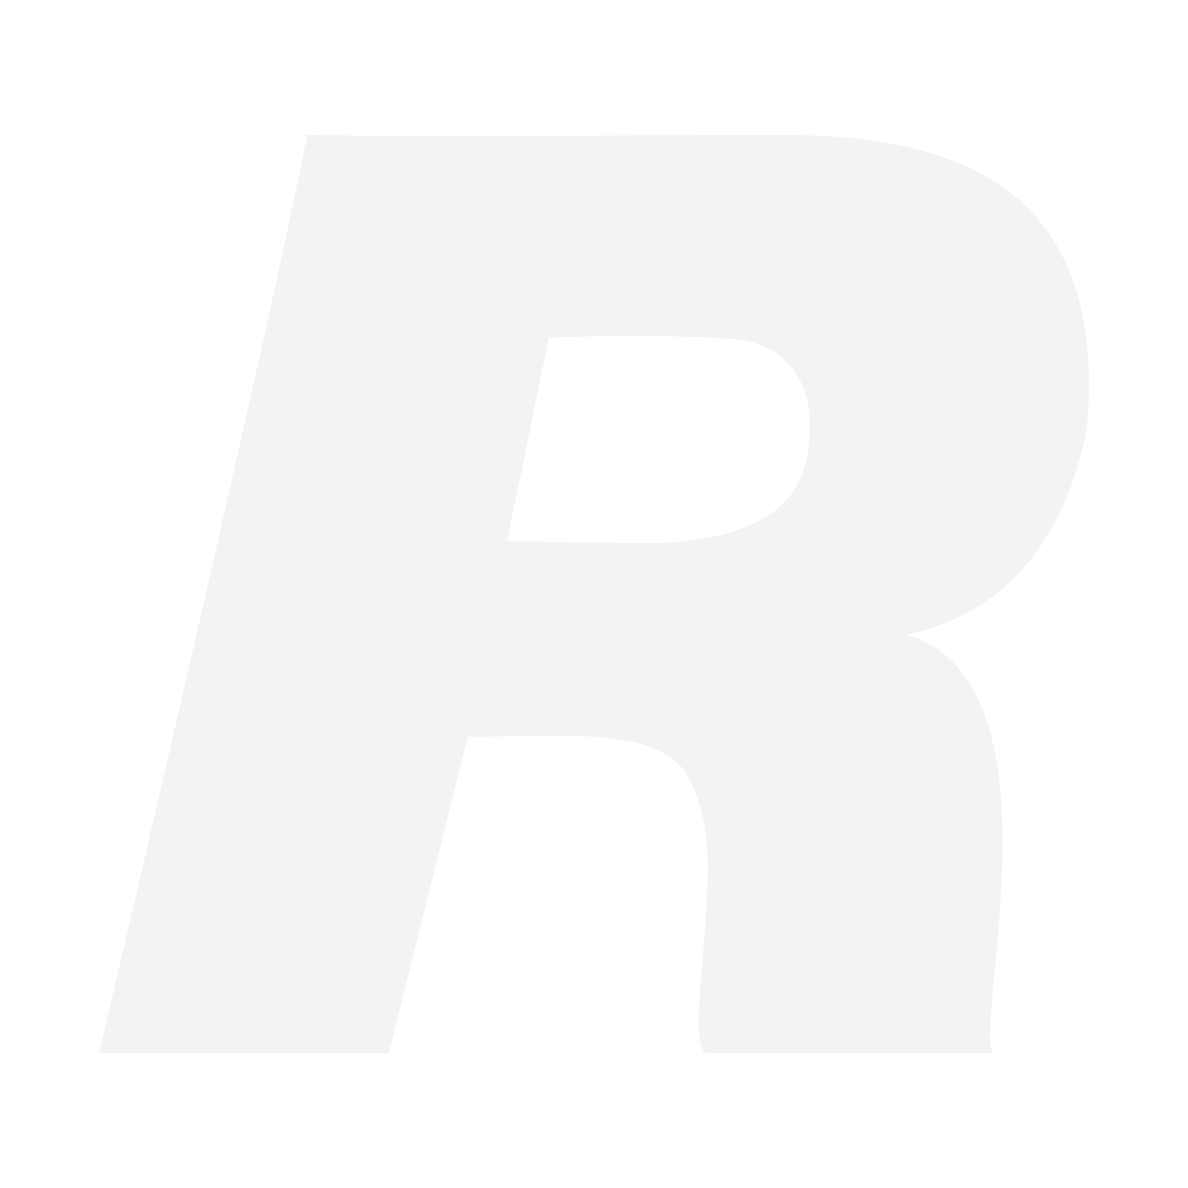 Sony A7R Mark II + Zeiss Vario Tessar T* FE 24-70/4 ZA OSS